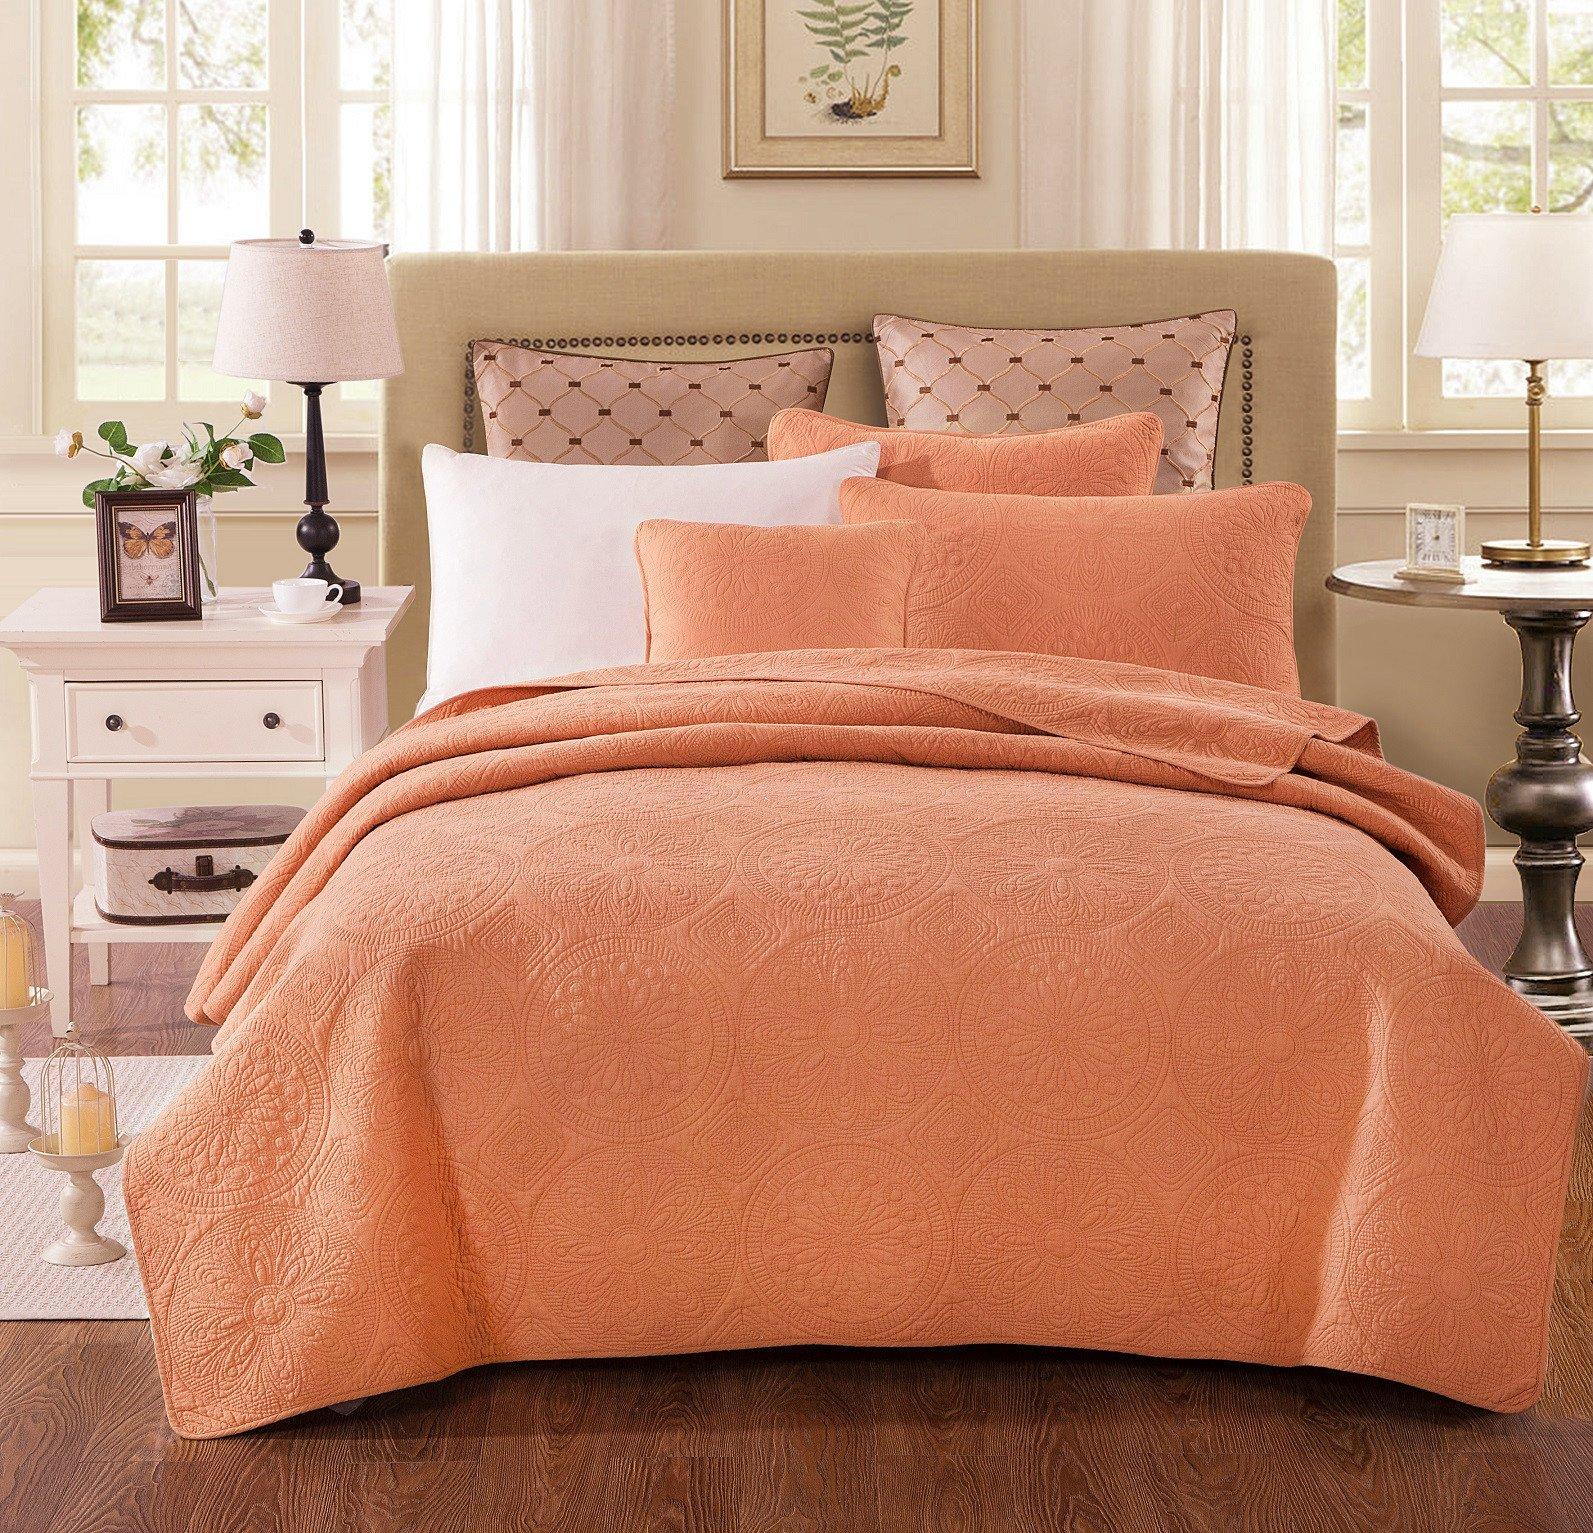 Tache Home Fashion Tuscany Sunrise Solid Floral Bedspread Set, King, Orange